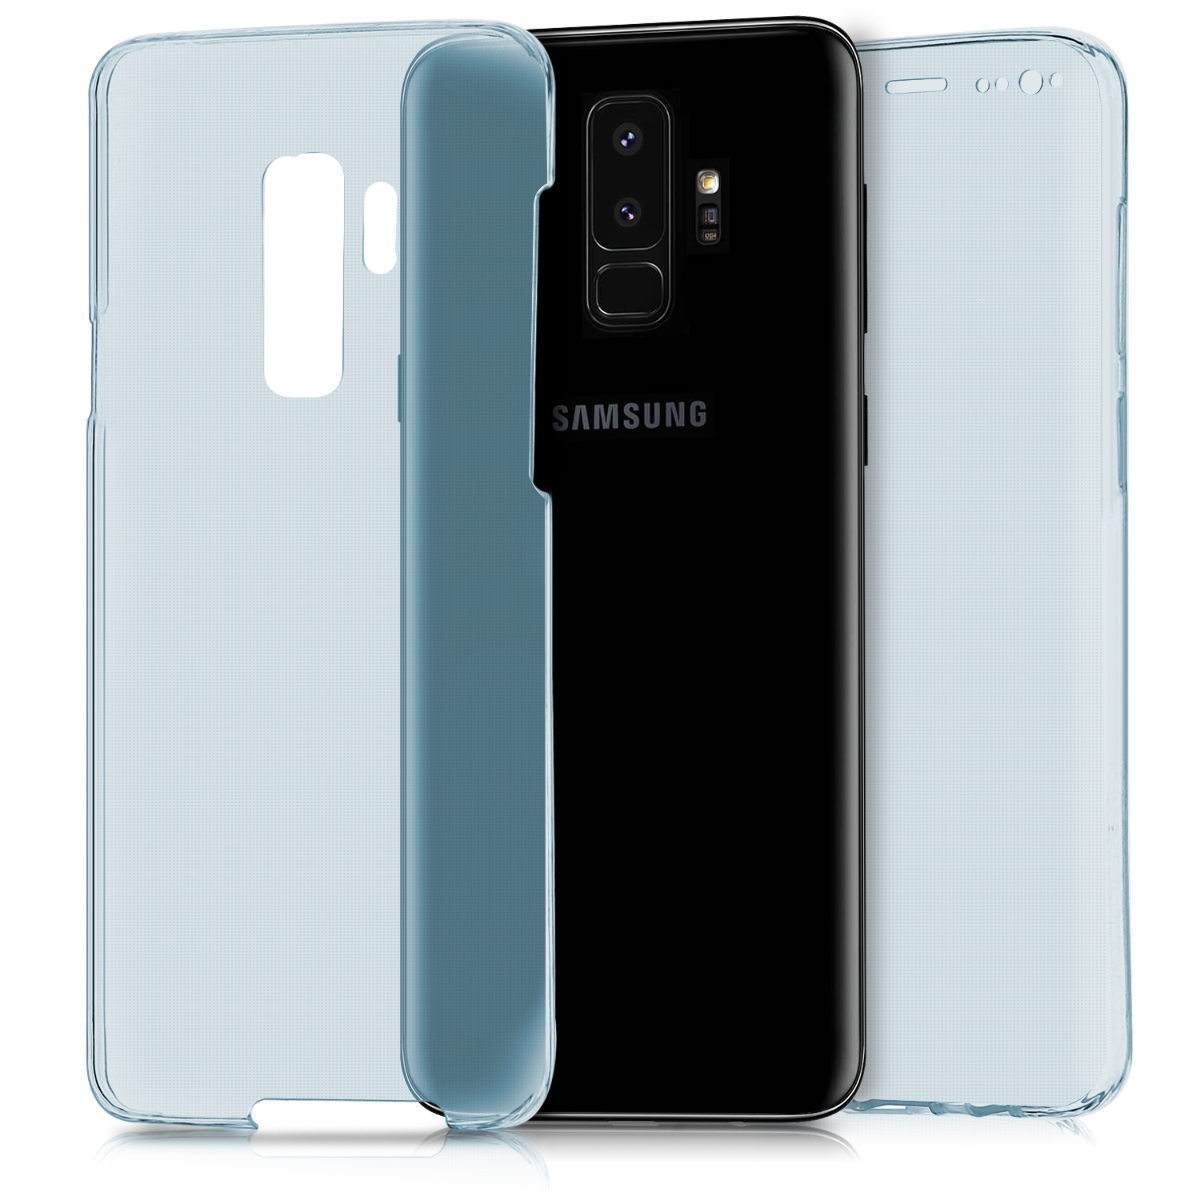 KW Θήκη Σιλικόνης Full Body Samsung Galaxy S9 Plus - Μπλε (44094.04)